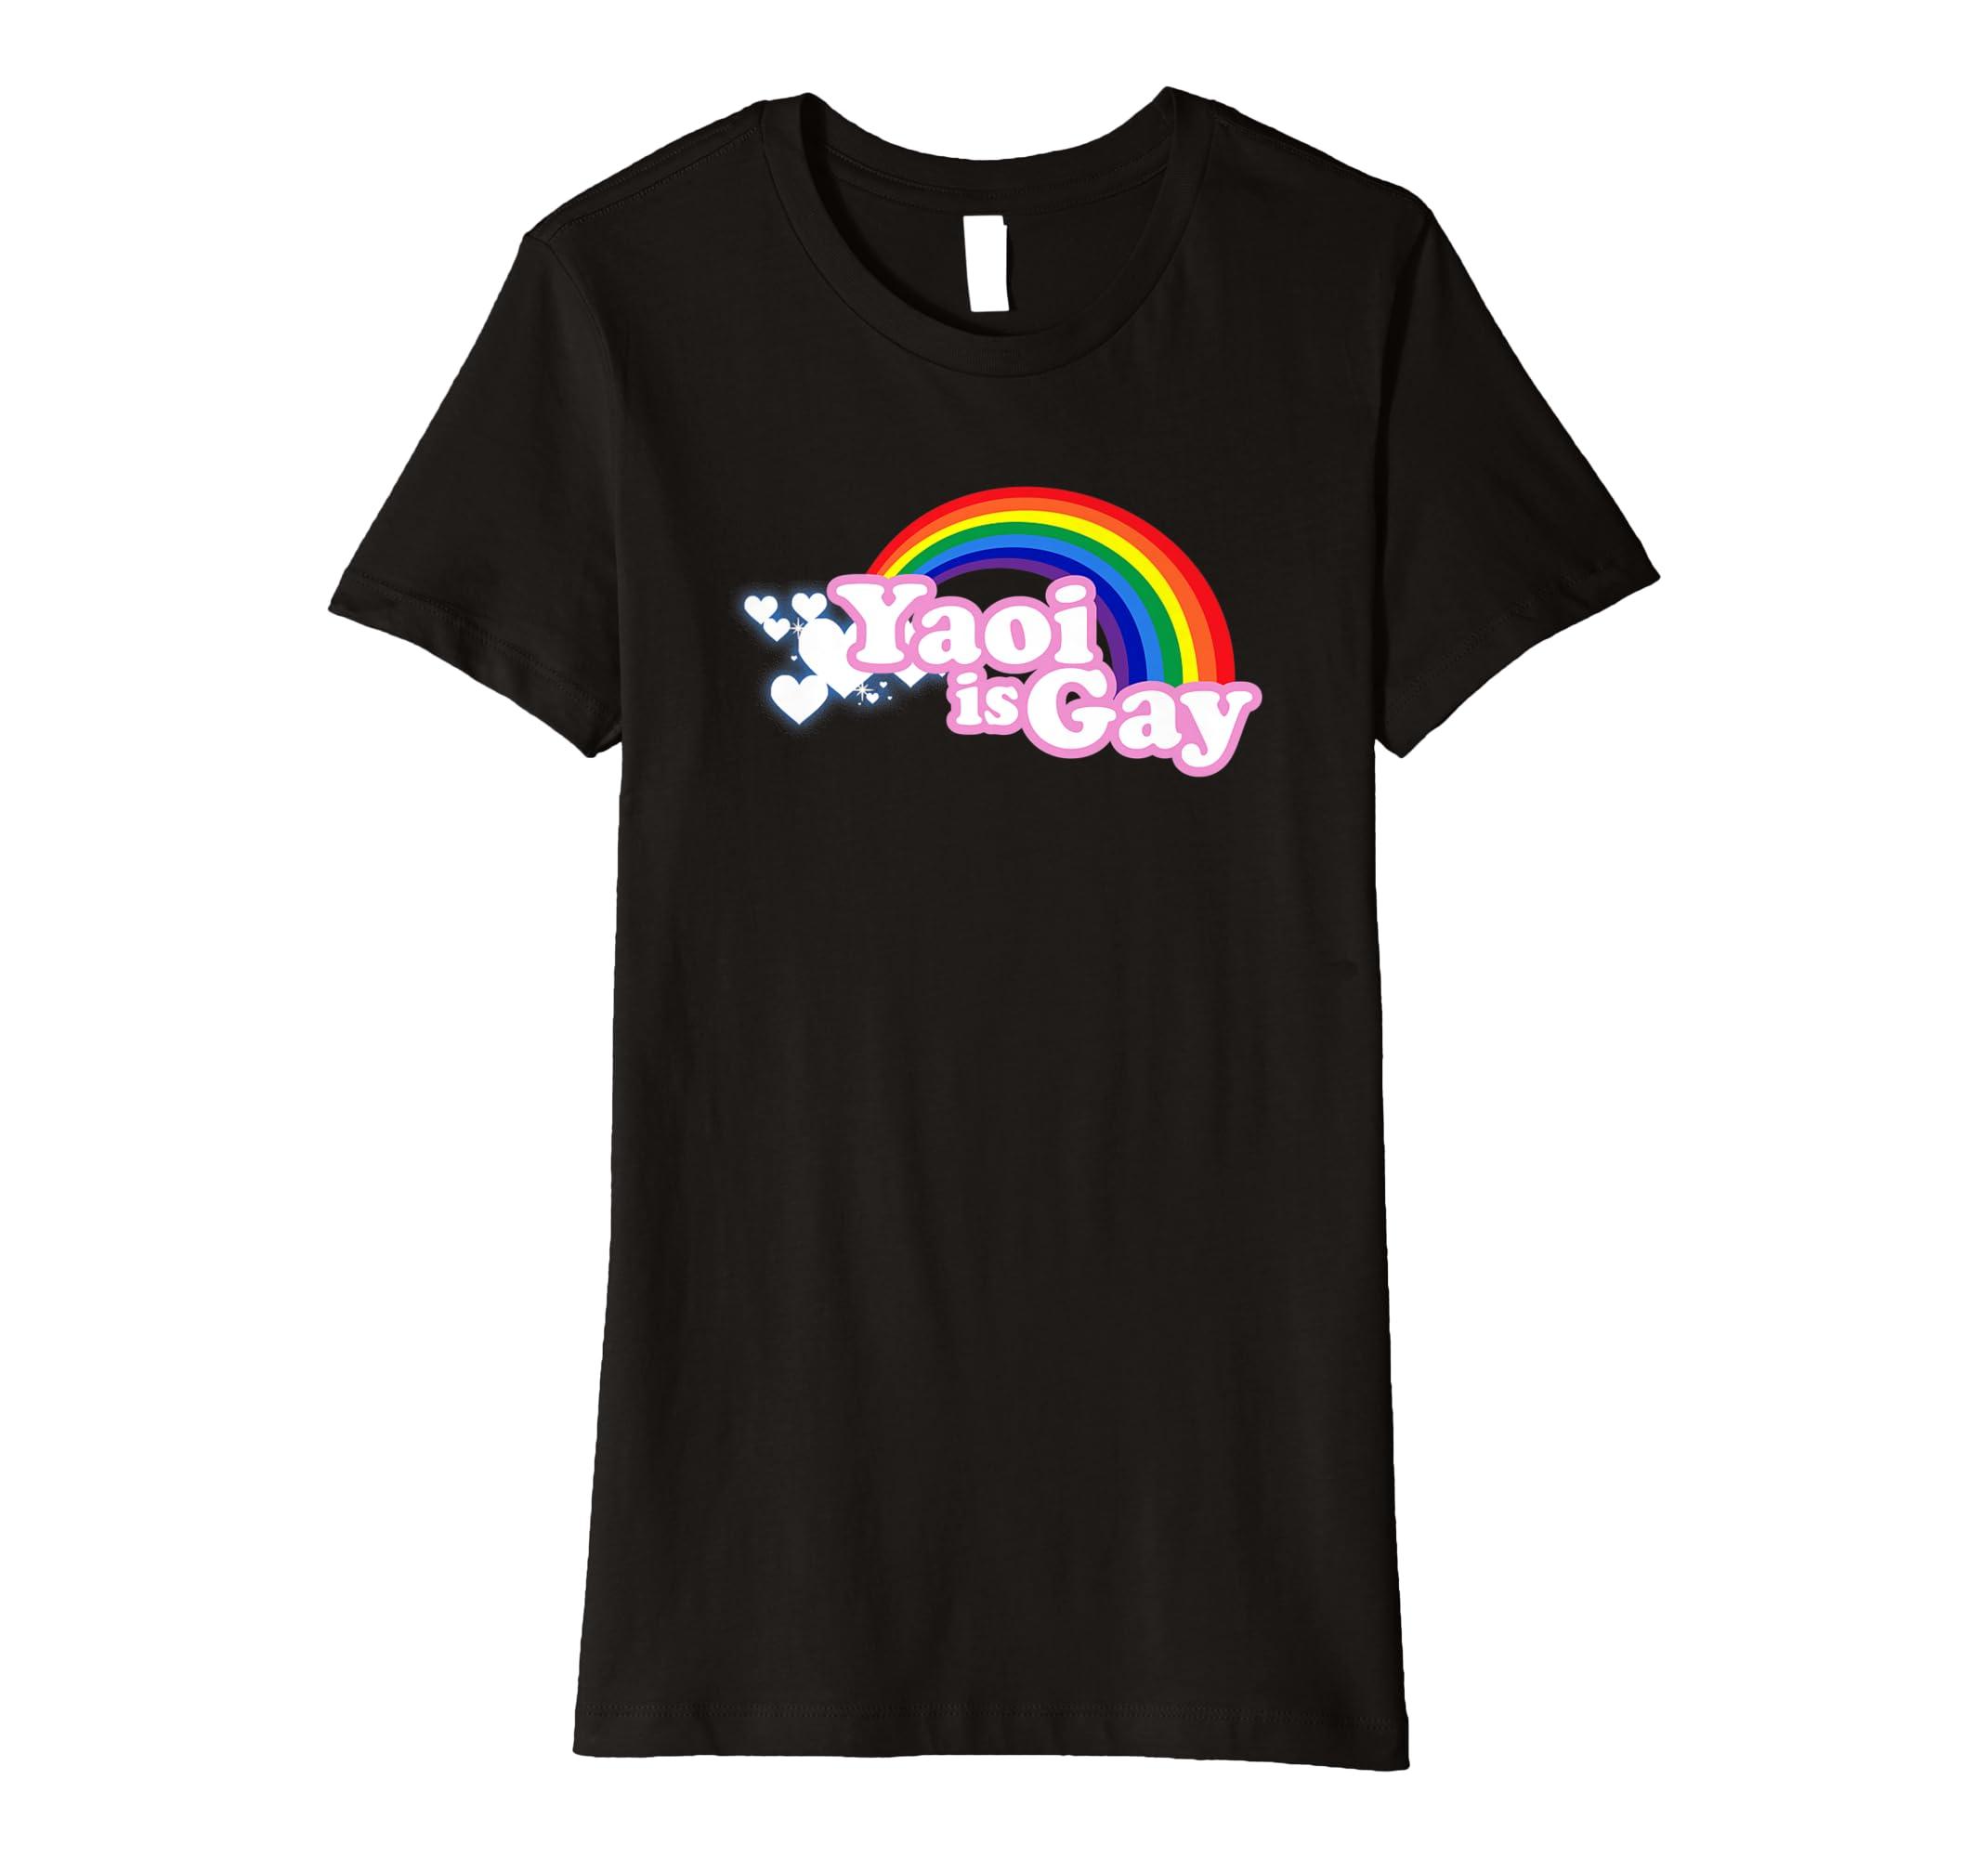 be440337d Amazon.com: merimeaux: Yaoi is Gay T-shirt: Clothing